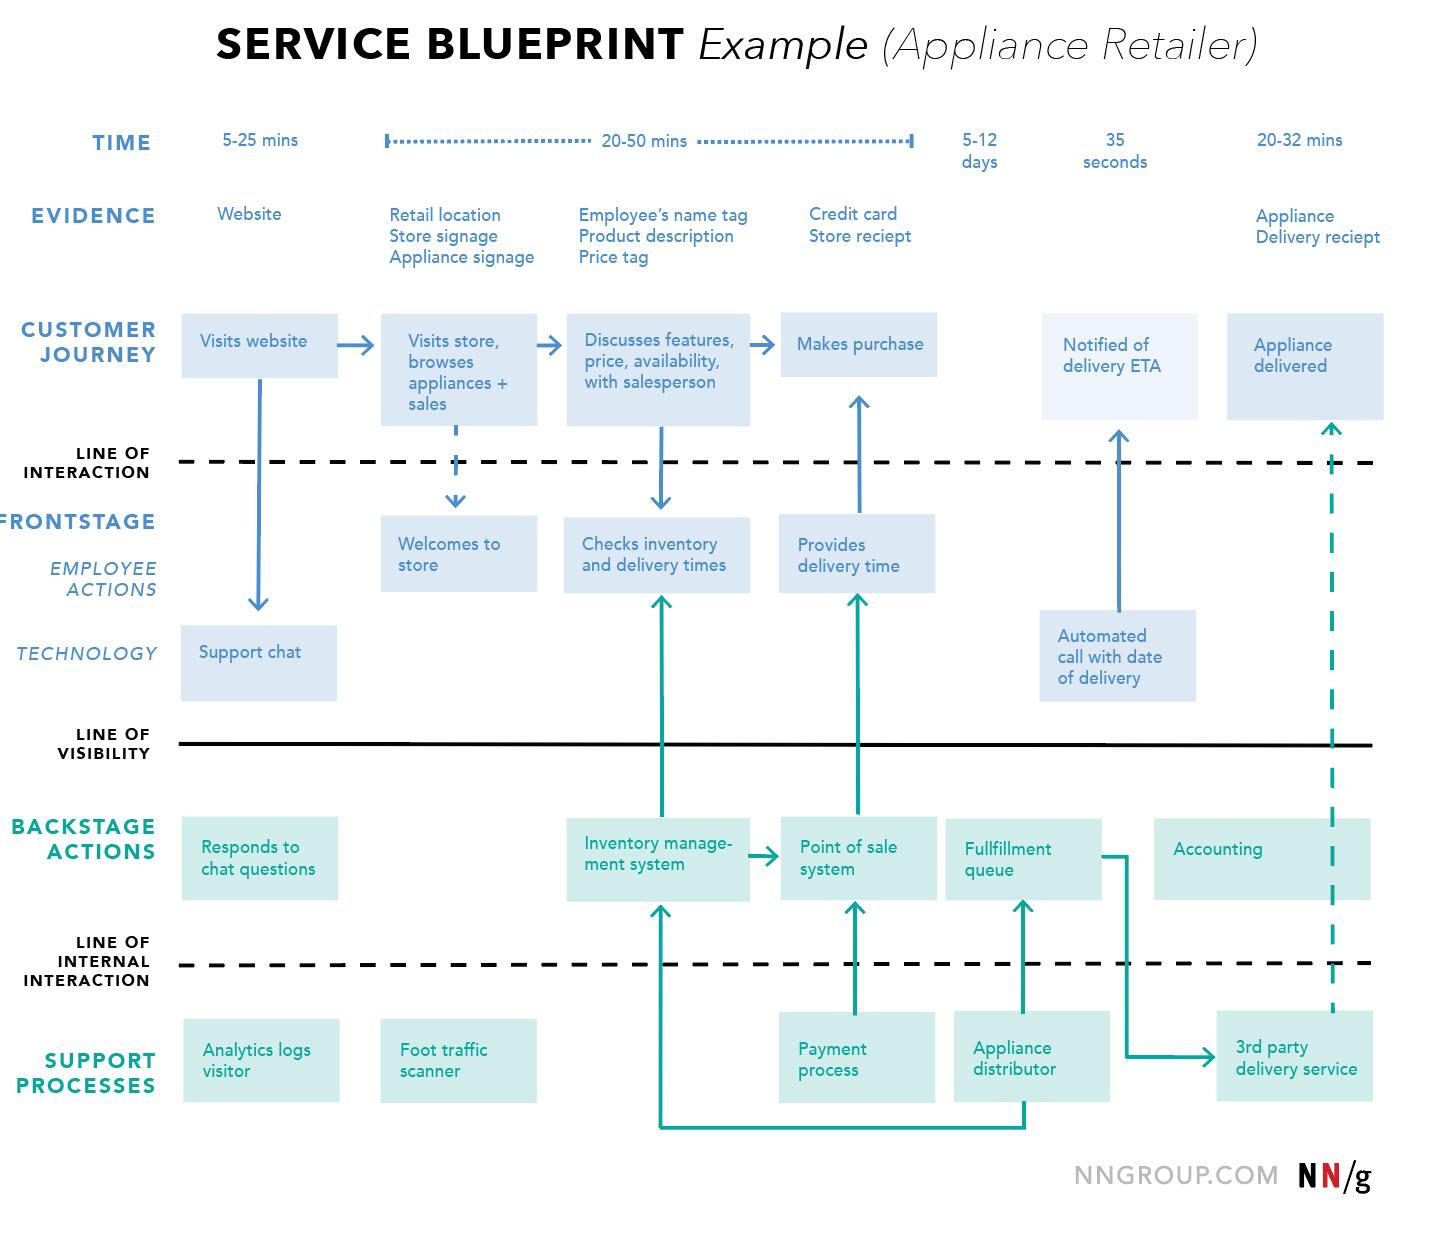 服务蓝图UX制图示例